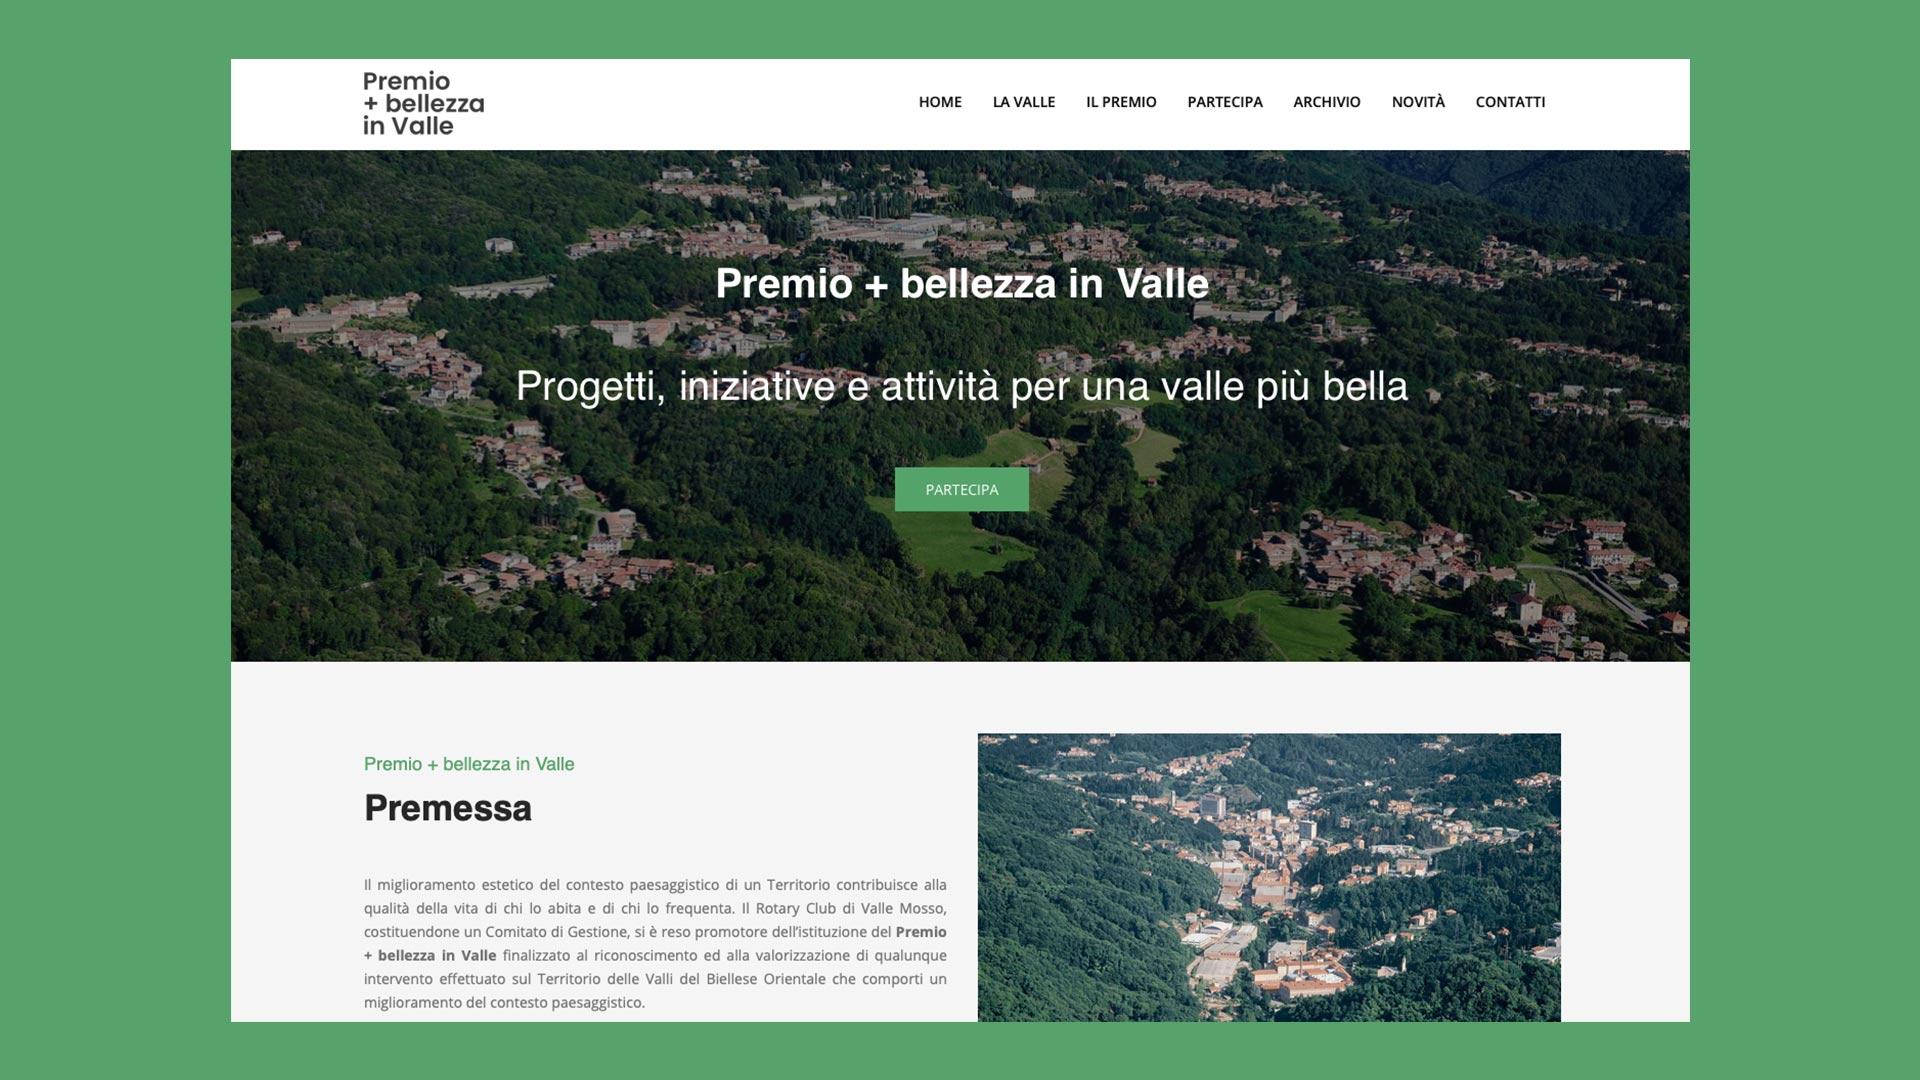 Premio-piu-bellezza-in-valle-s - OrangePix